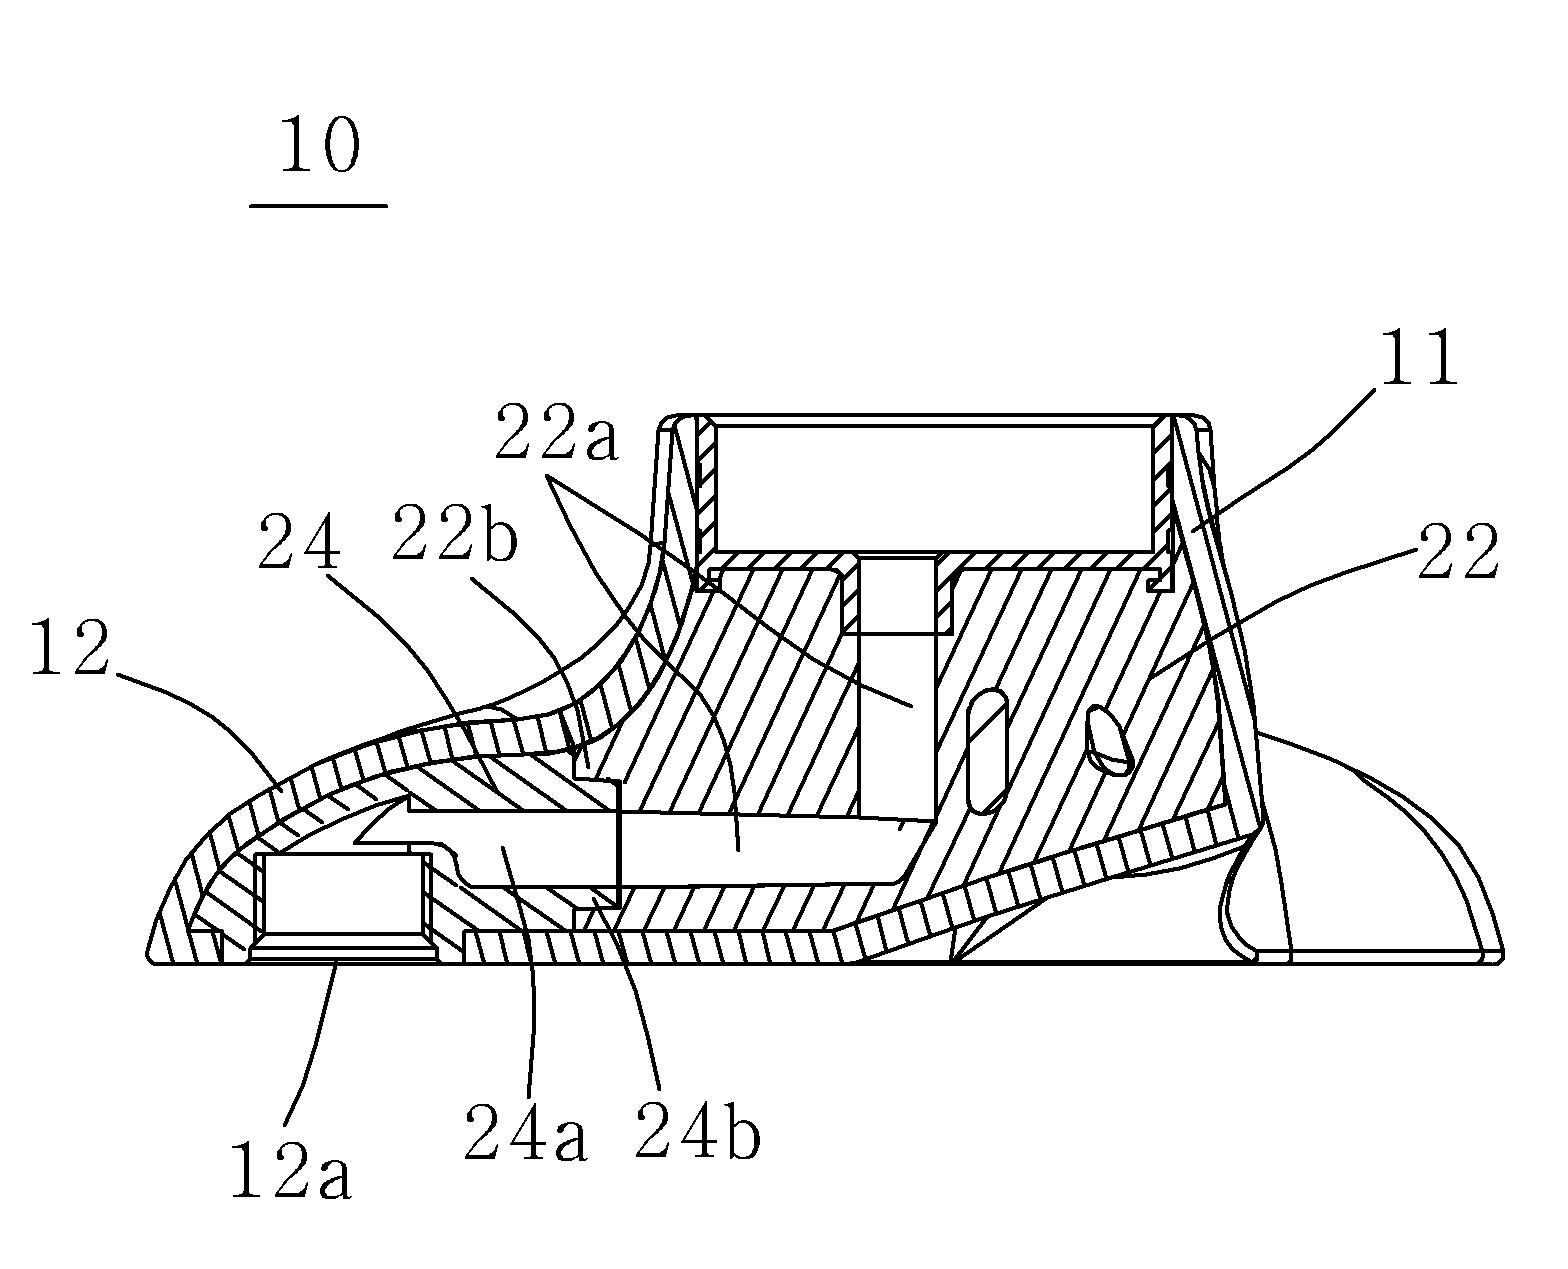 patent wo2012124875a1